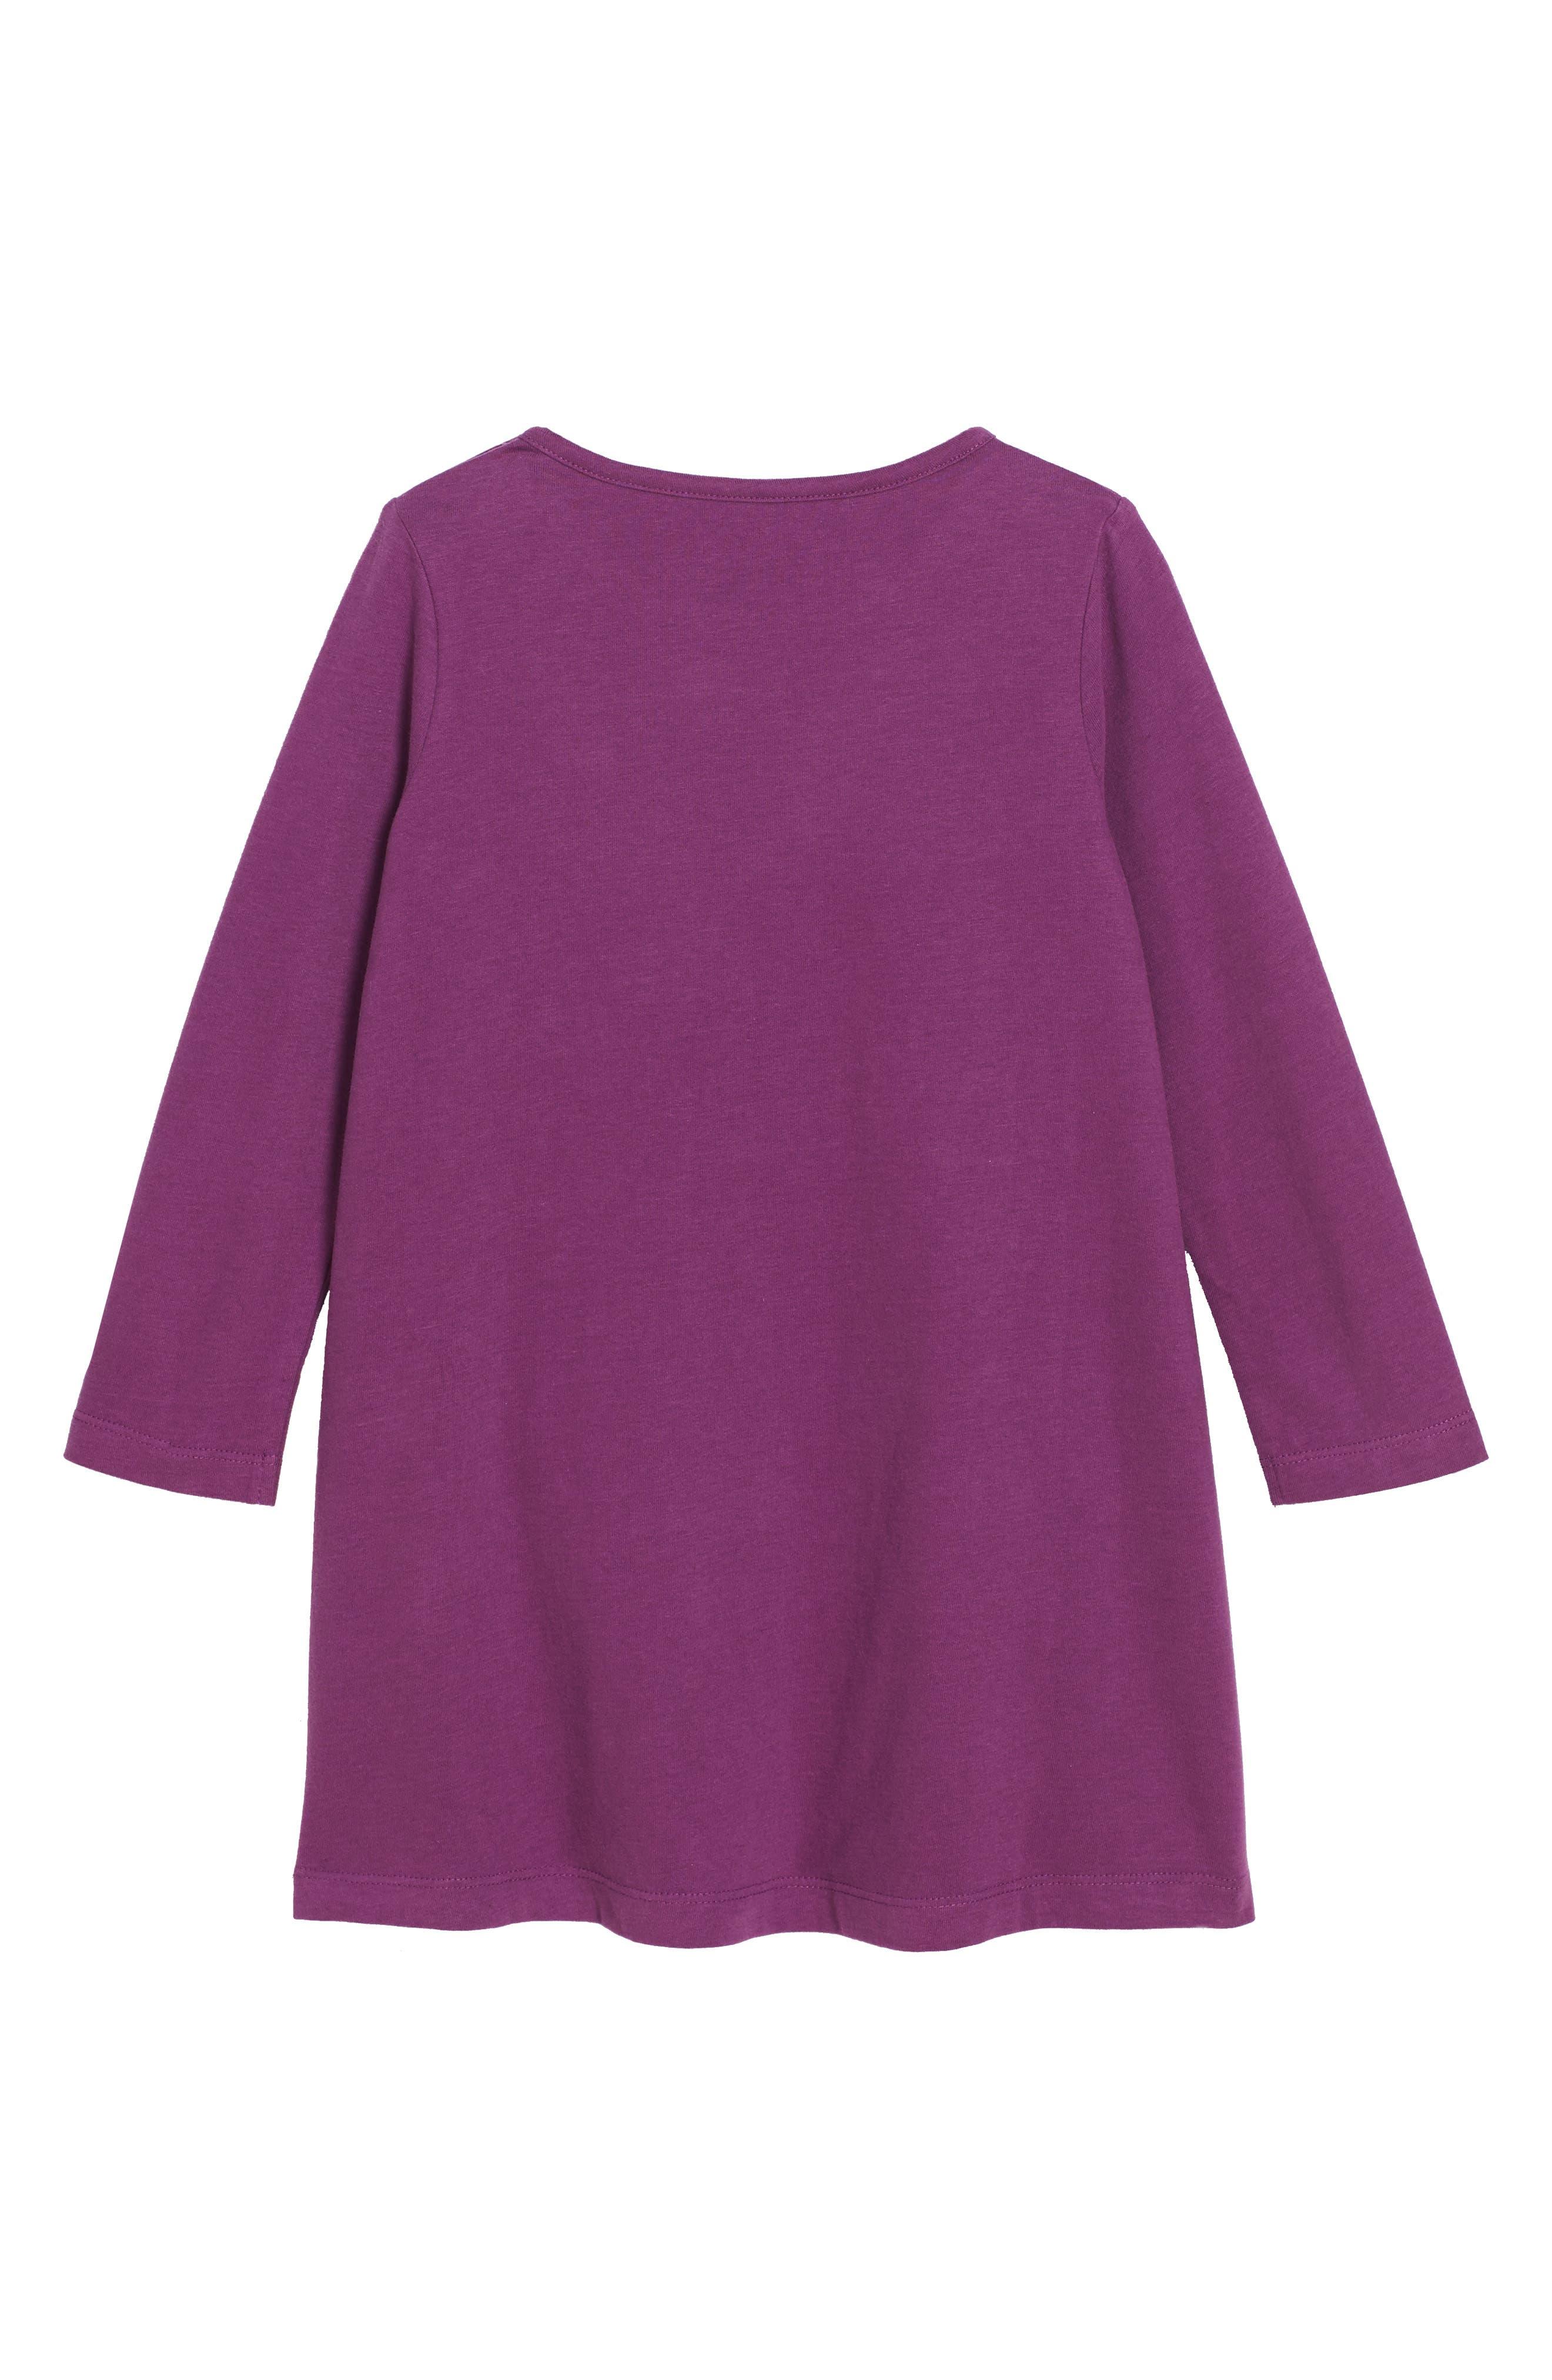 Alternate Image 2  - Mini Boden Fairytale Appliqué Dress (Little Girls & Big Girls)